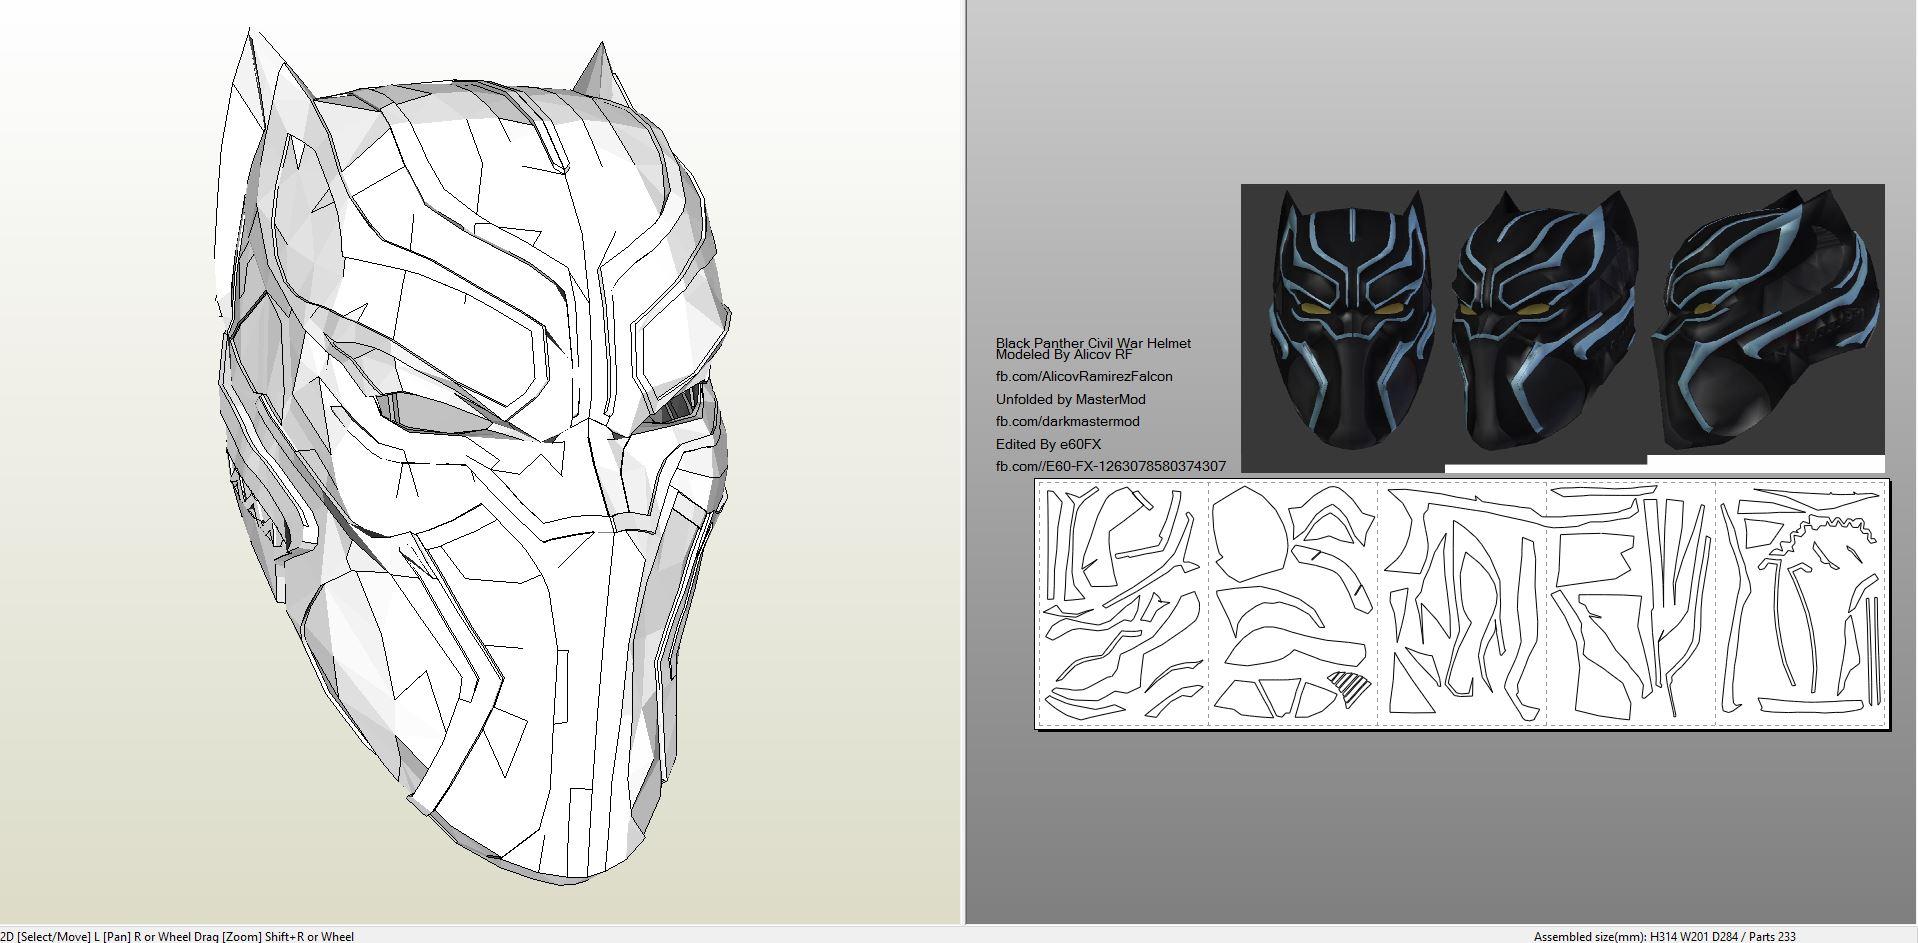 foamcraft pdo file template for black panther civil war helmet